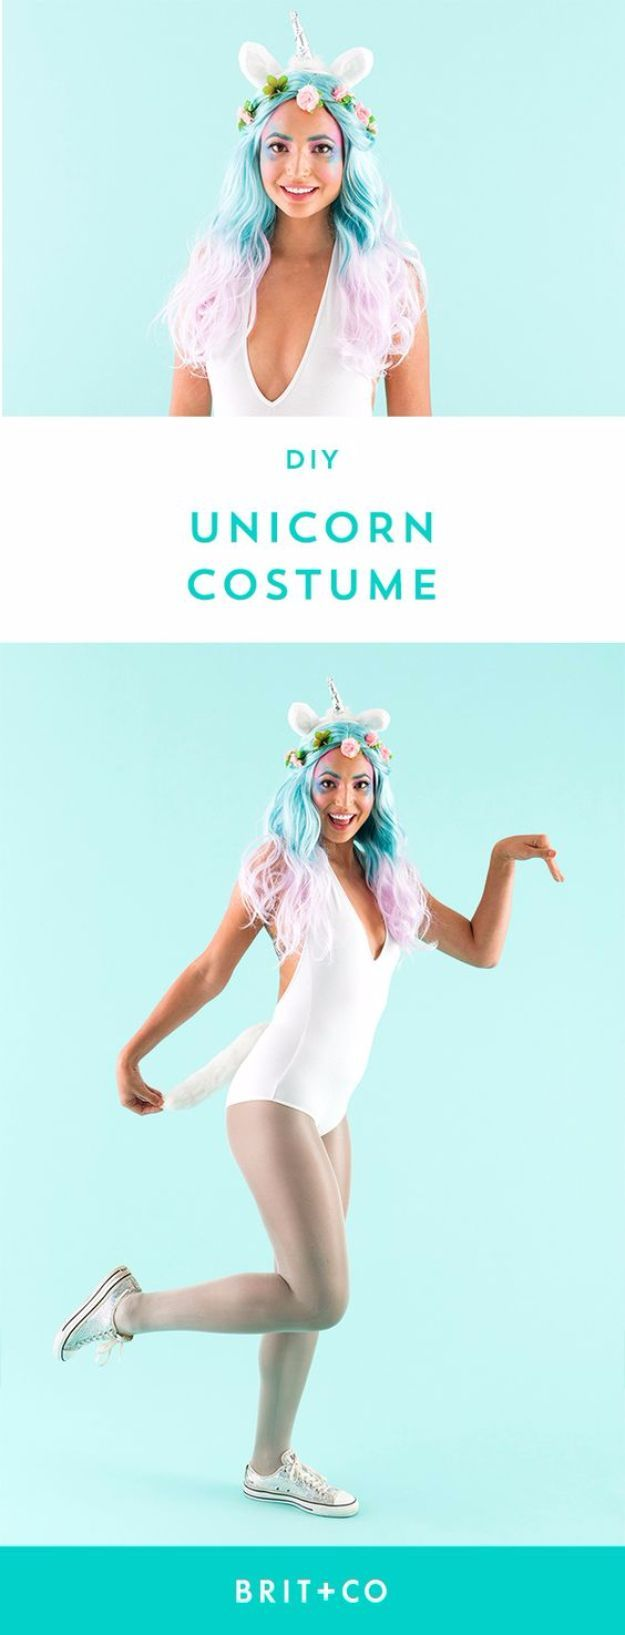 Best diy halloween costume ideas diy unicorn costume do it best diy halloween costume ideas diy unicorn costume do it yourself costumes solutioingenieria Images